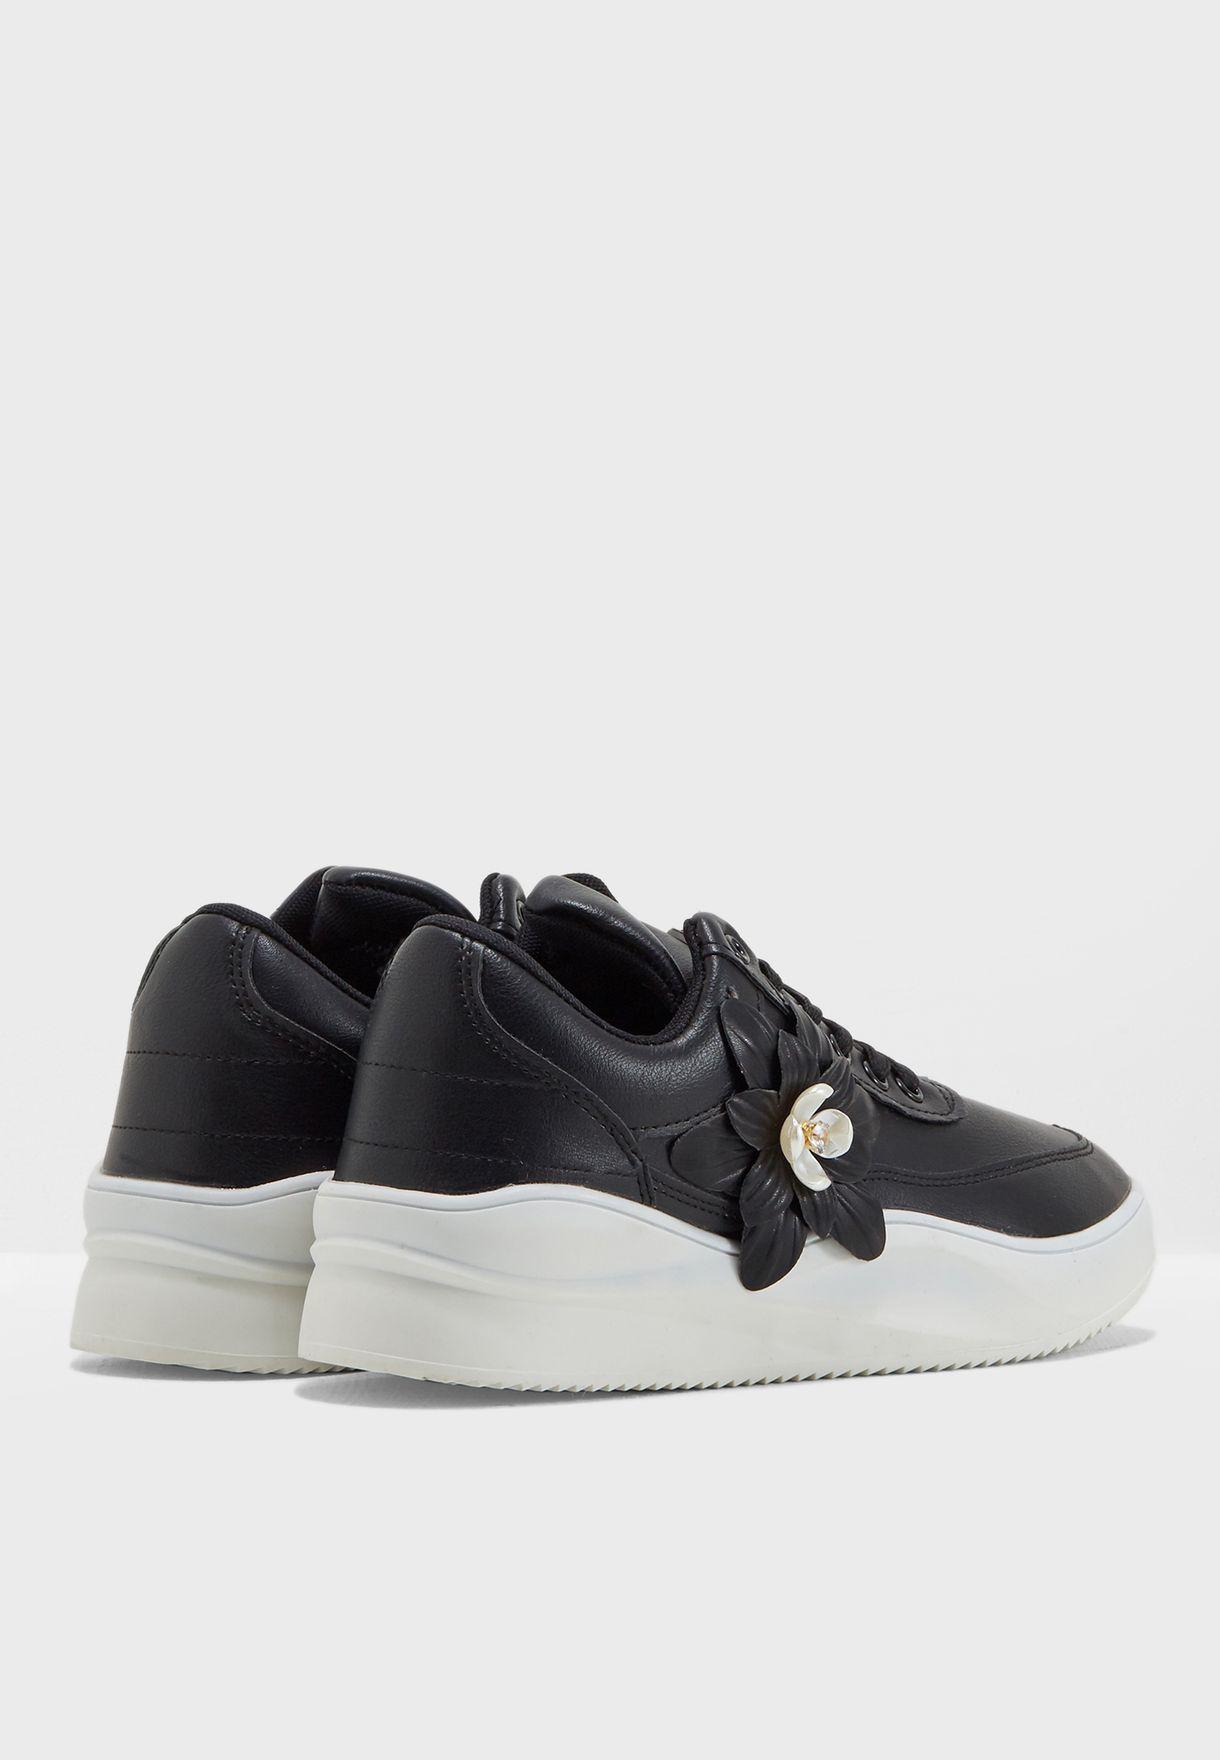 Floral Low Top Sneaker